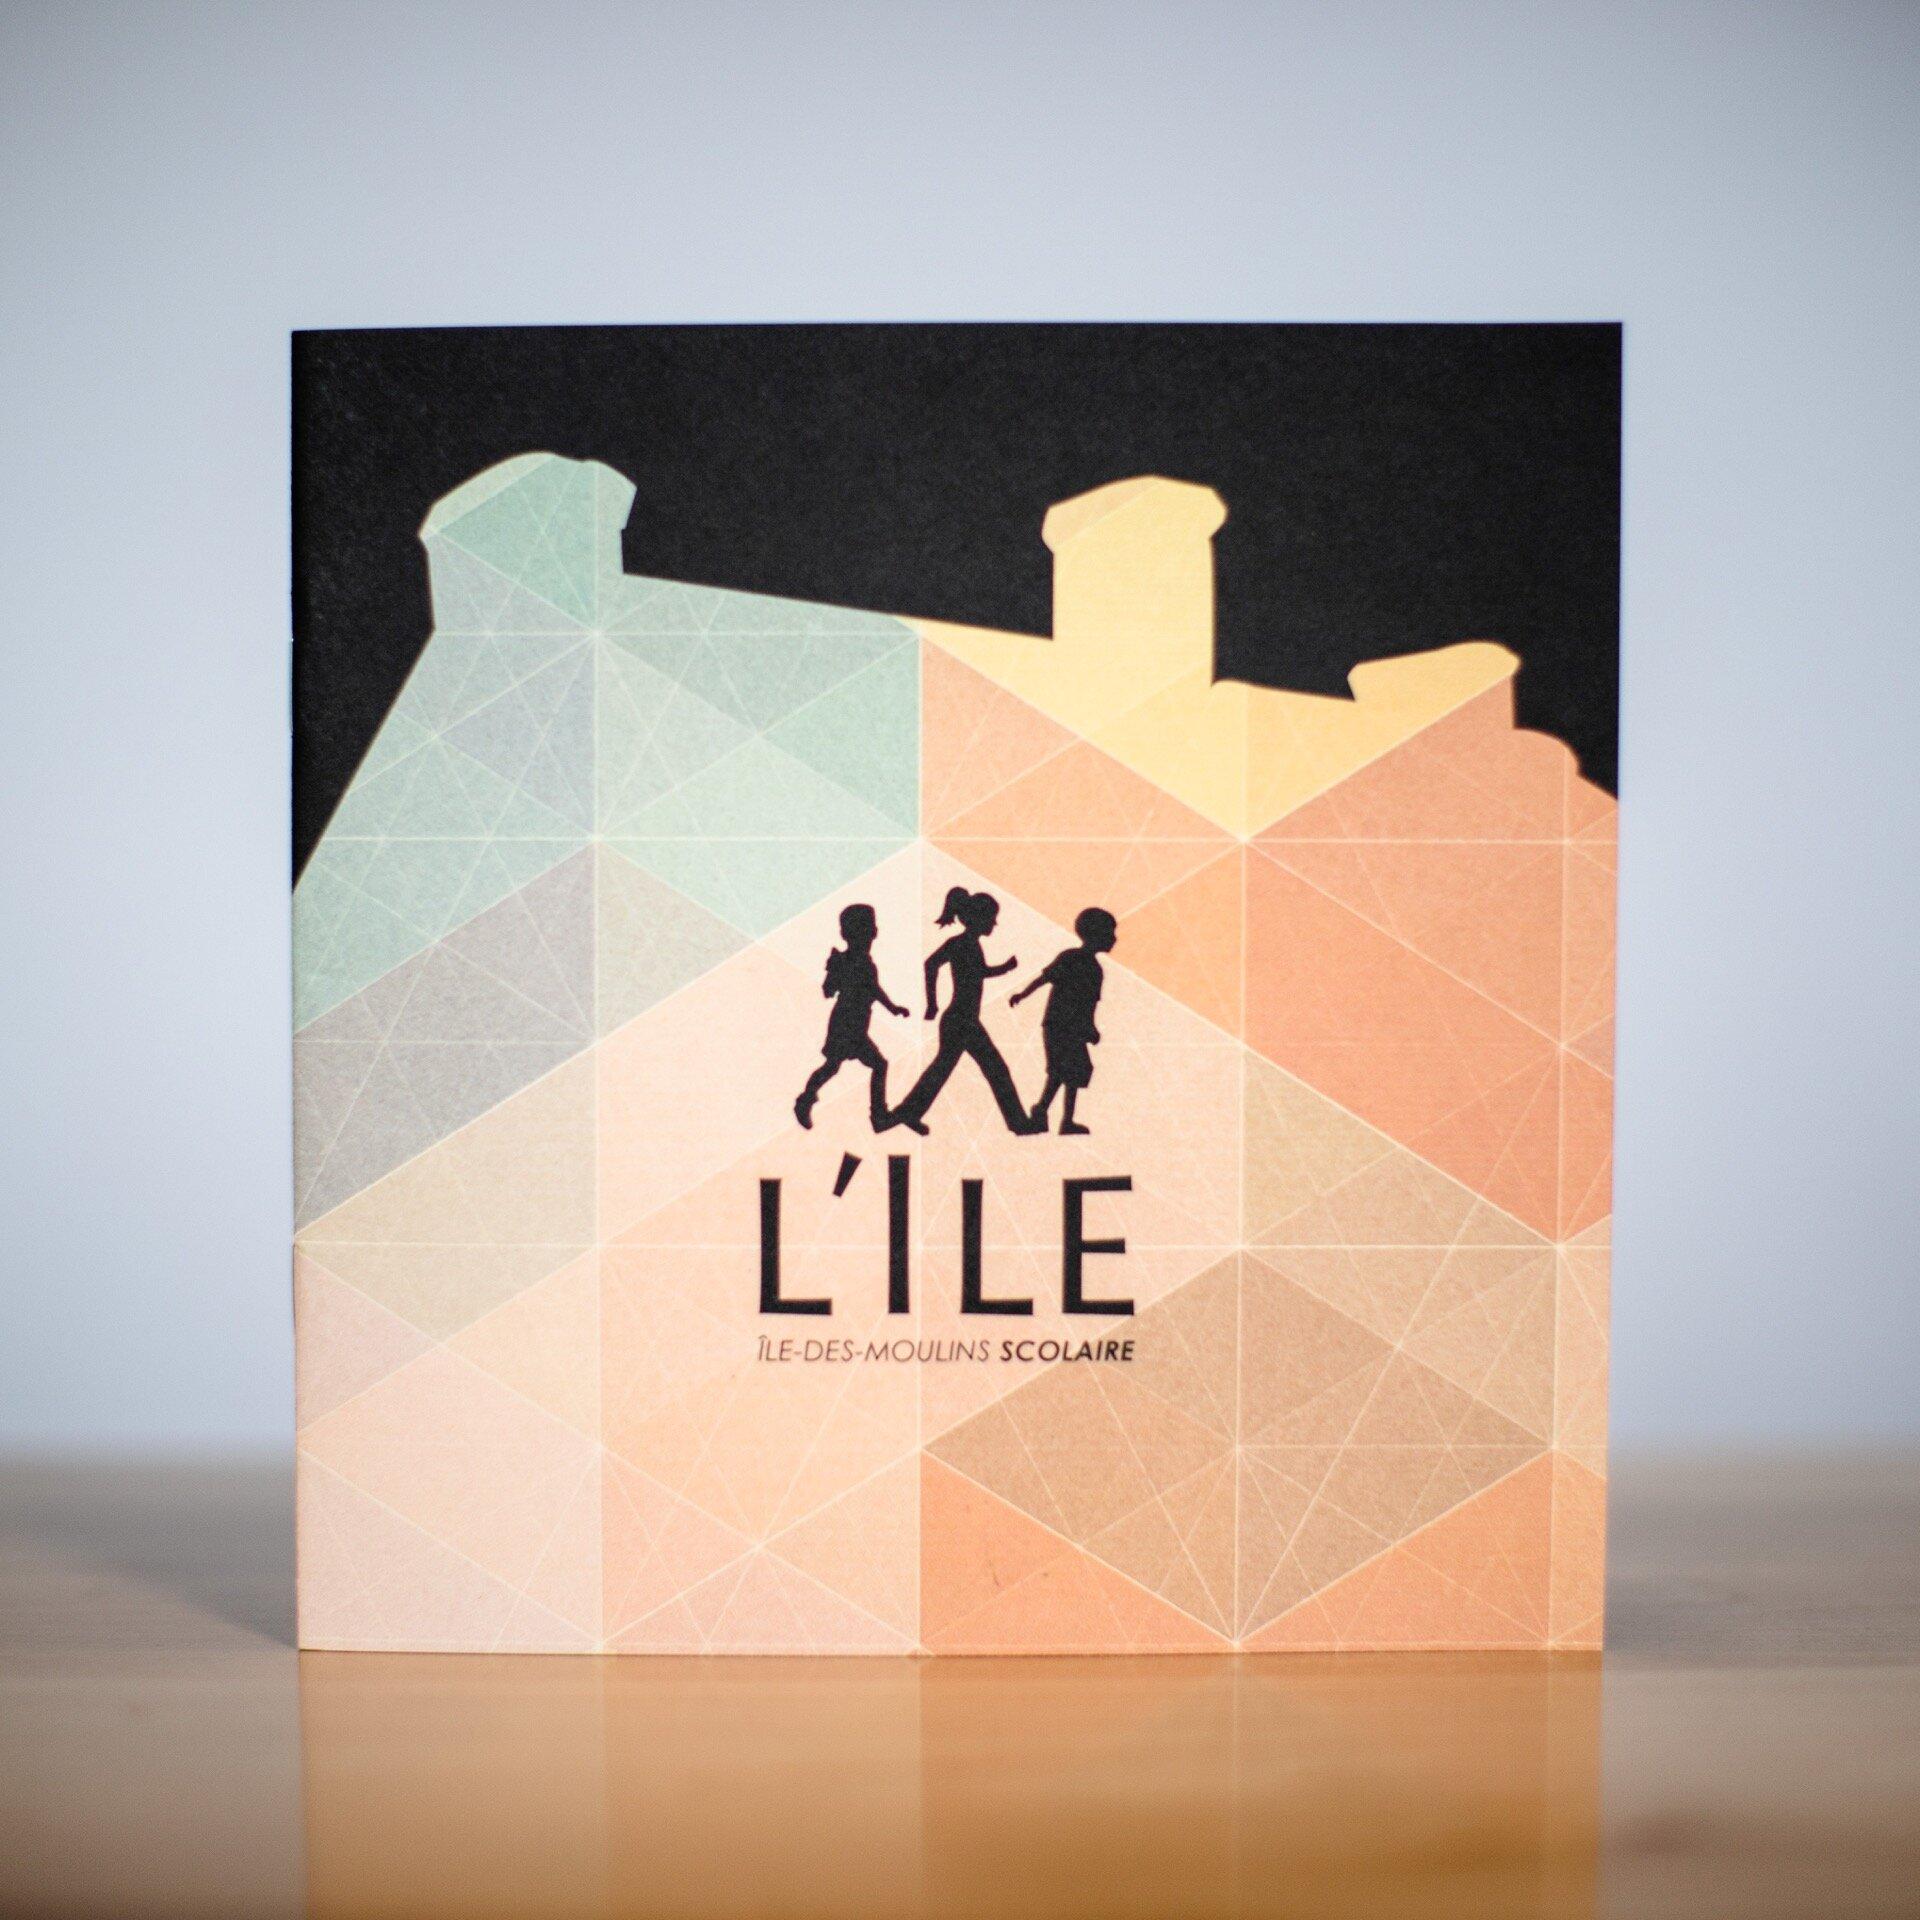 ile-des-moulins-scolaire-olivier-lamarre-design-graphiste-1.jpg